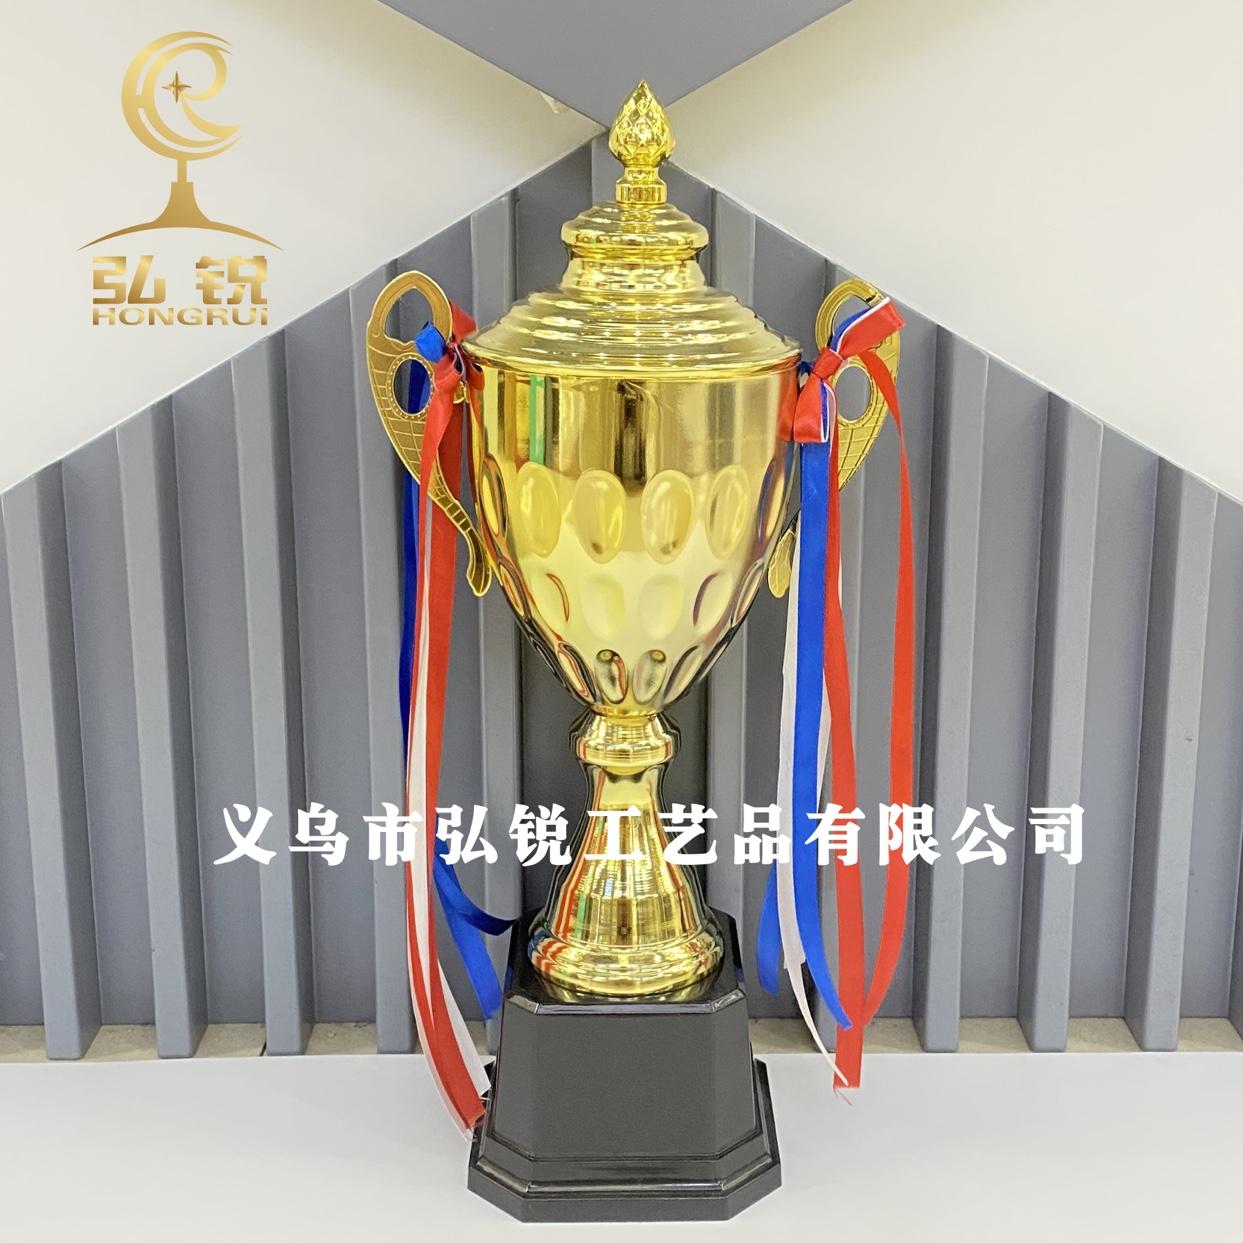 HR-1041A++ 金属奖杯  18*55CM公司颁奖比赛奖品奖励可定制logo